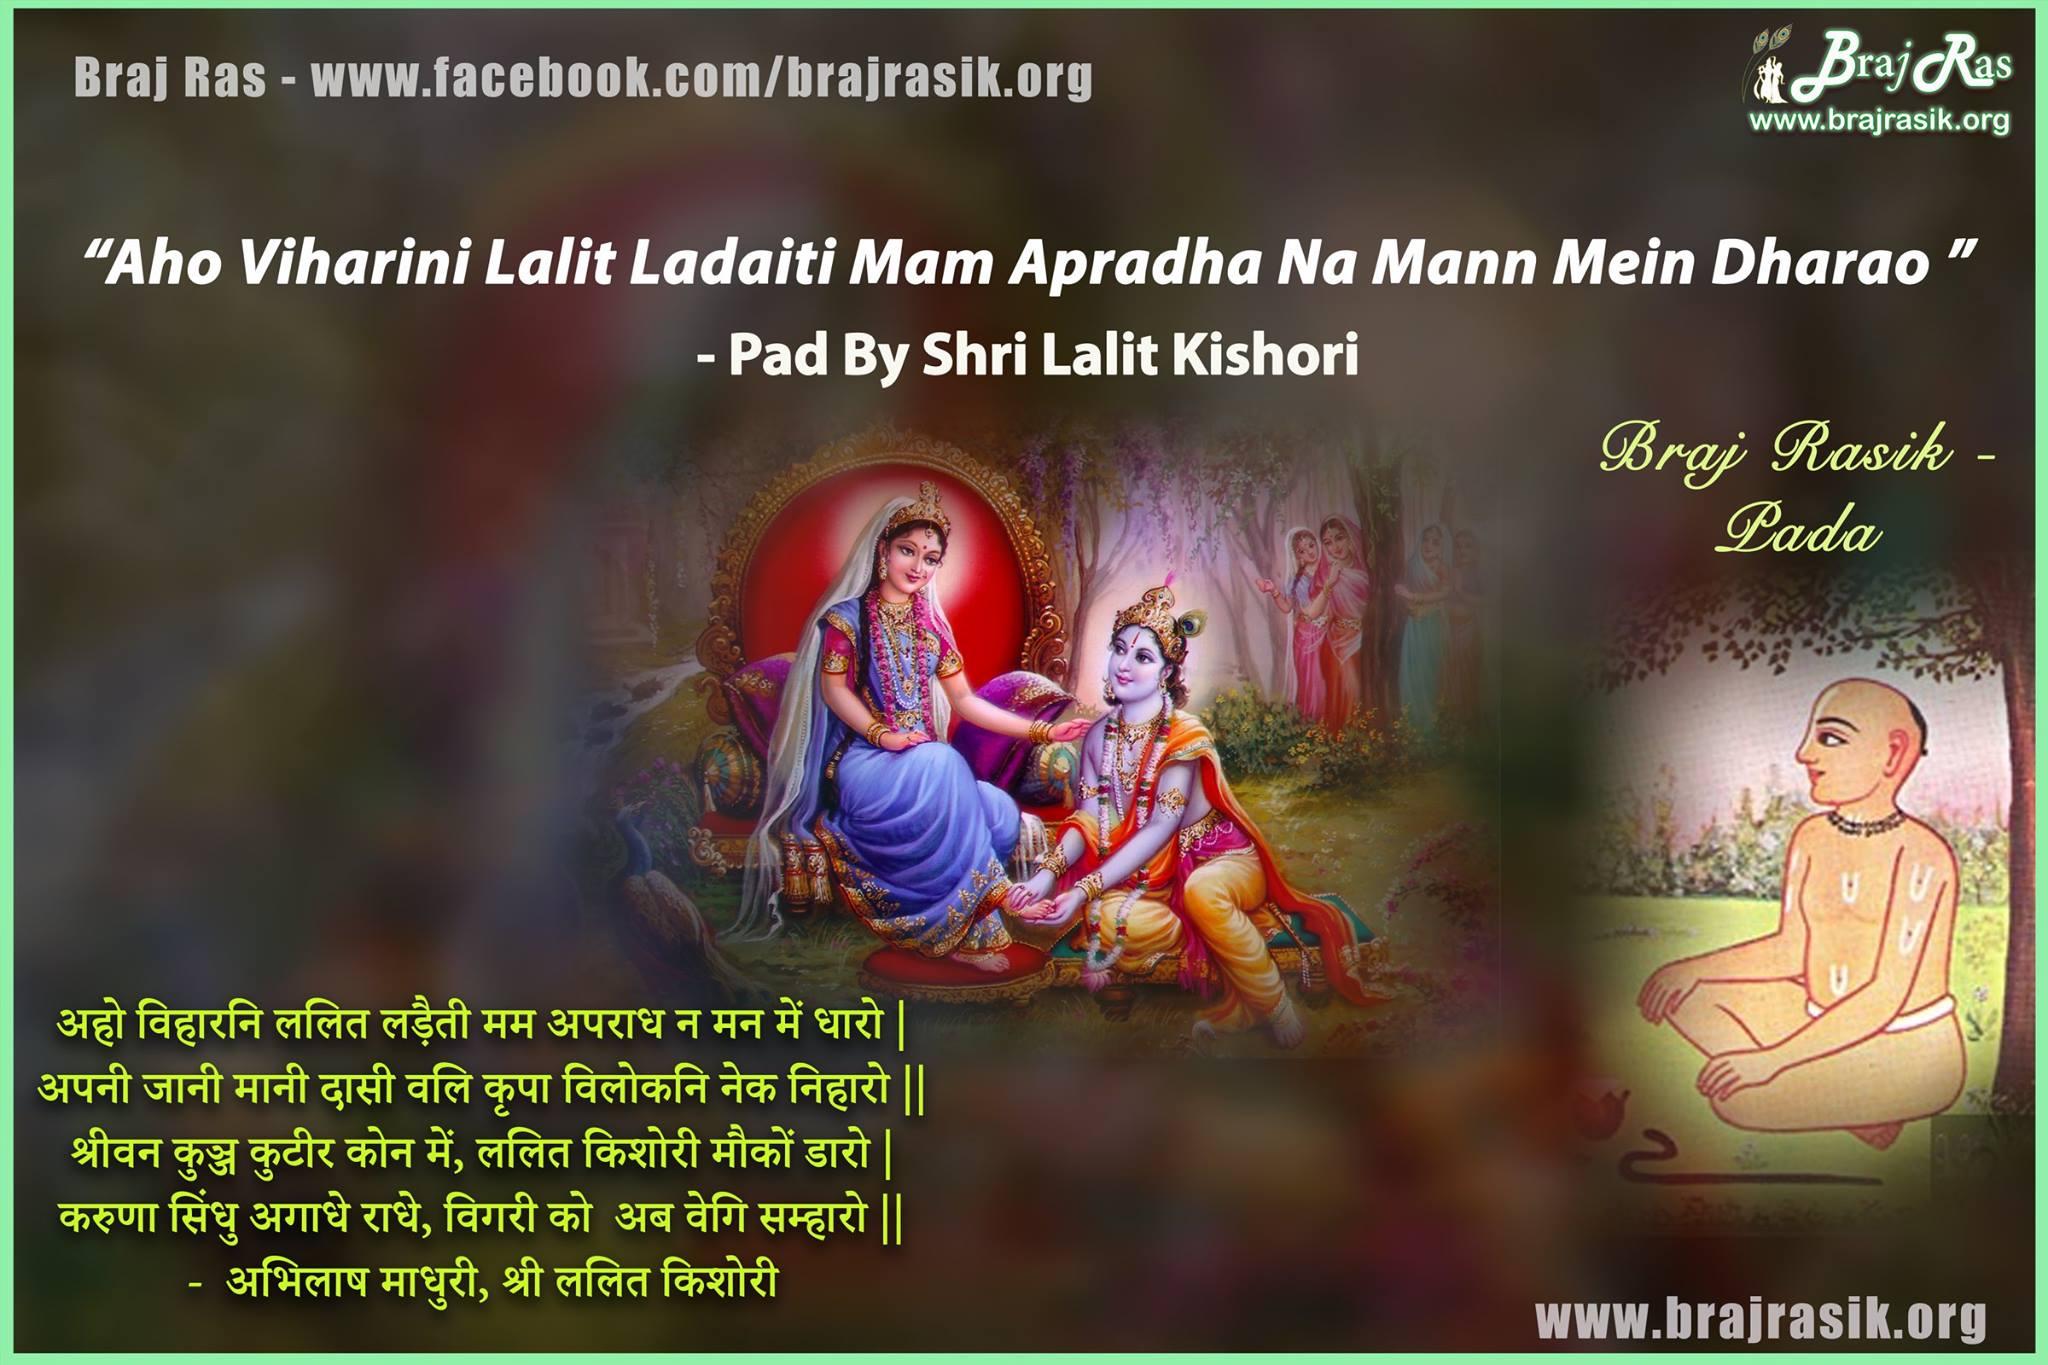 Aho Viharini Lalit Ladaiti, Mama Apradh Na Mana Mein Dhaaro - Pada Written By Shri Lalit Kishori